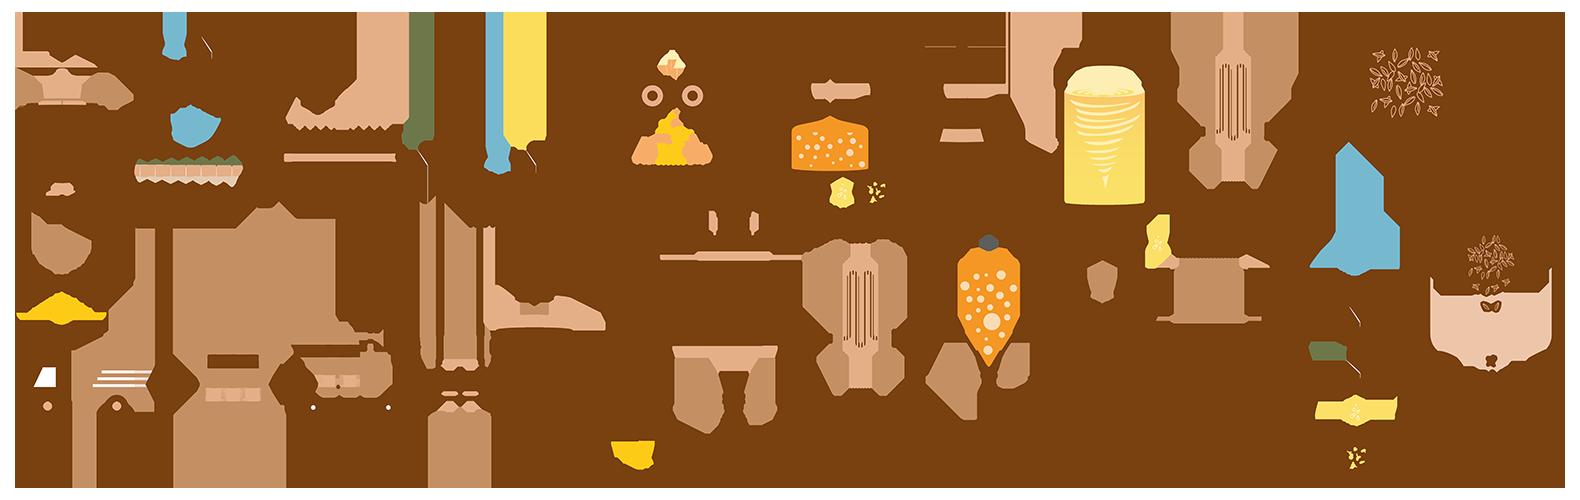 funbrew process